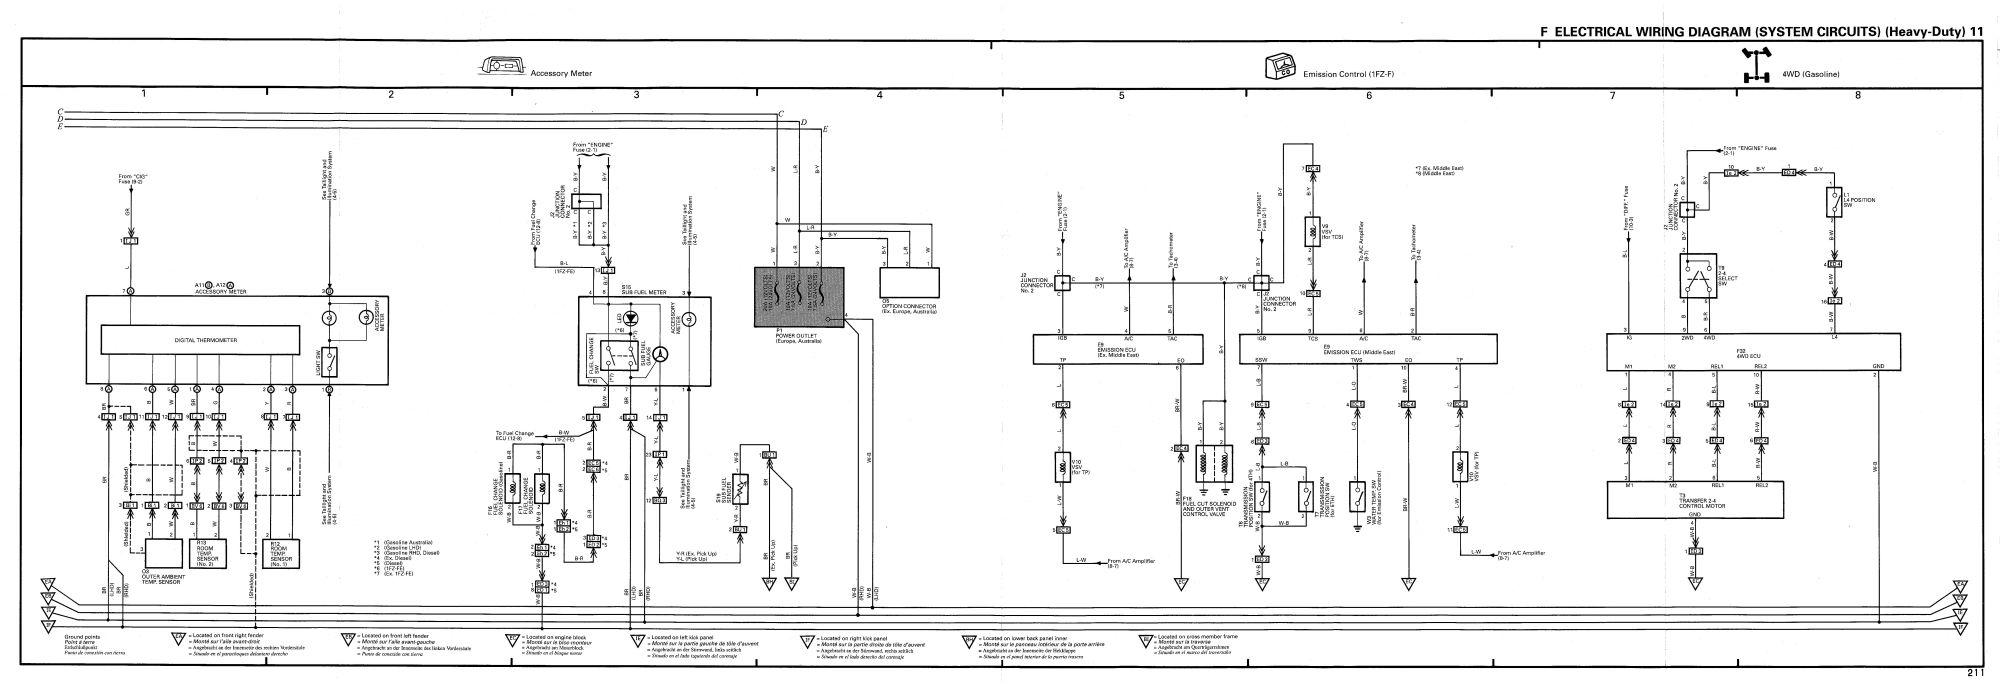 hight resolution of toyota land cruiser 1990 1998 wiring diagram heavy duty 11